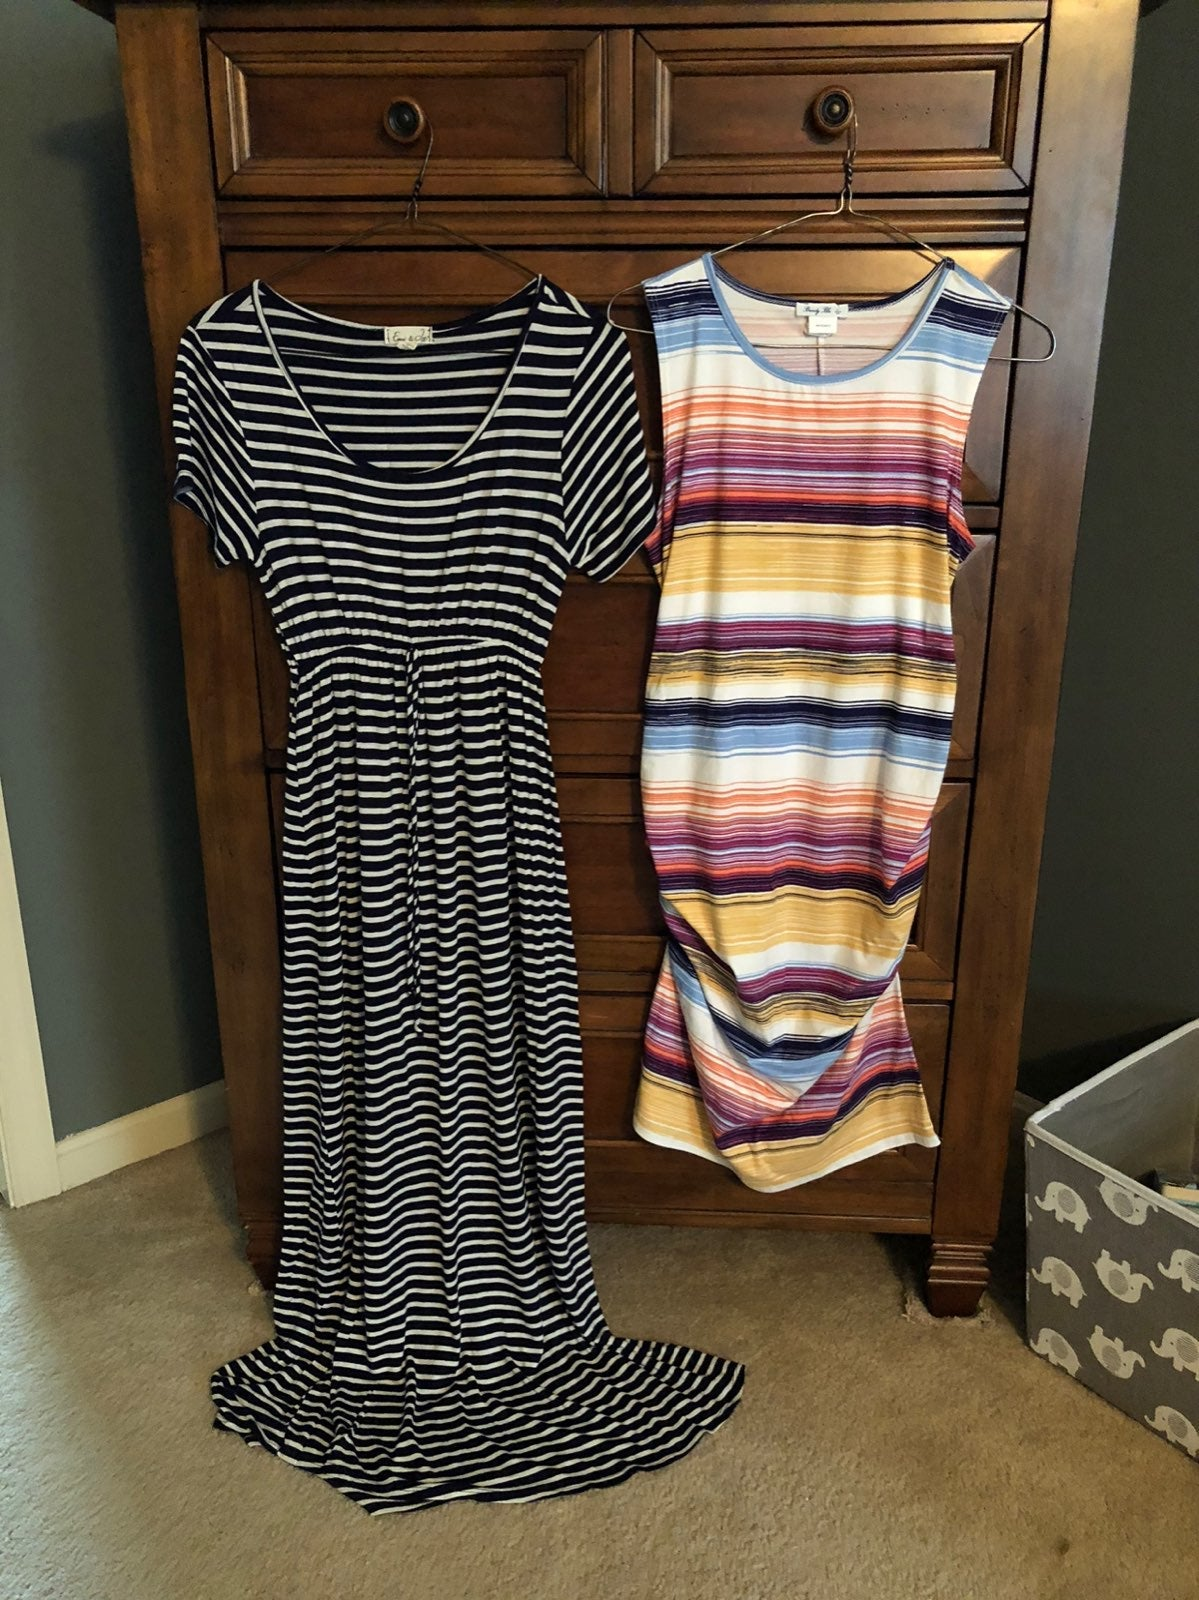 2 Maternity dresses